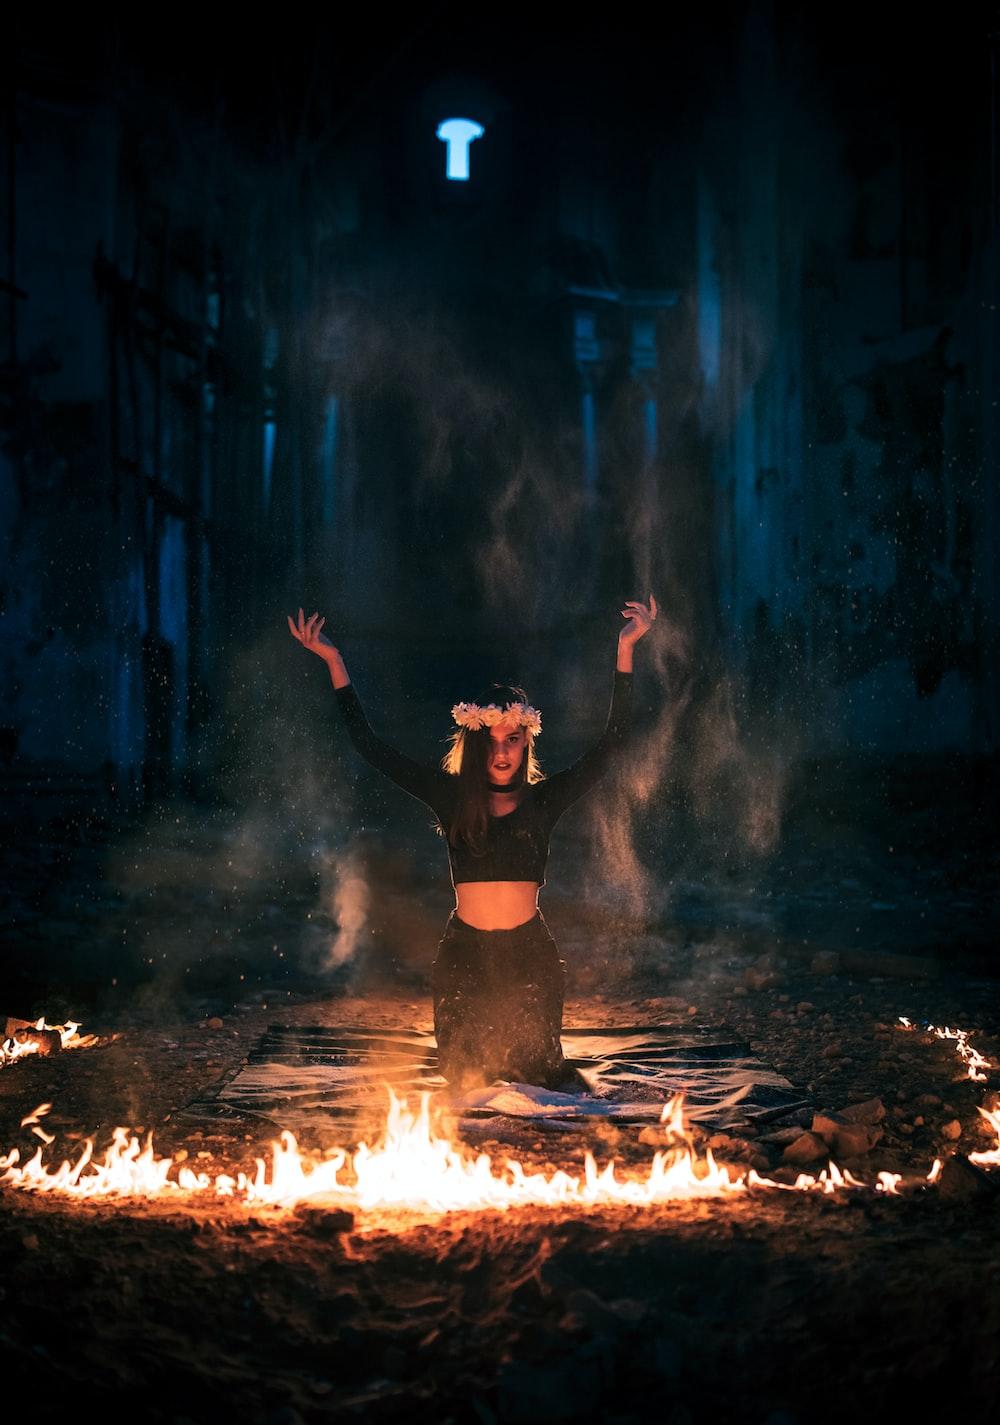 woman in black dress standing on fire